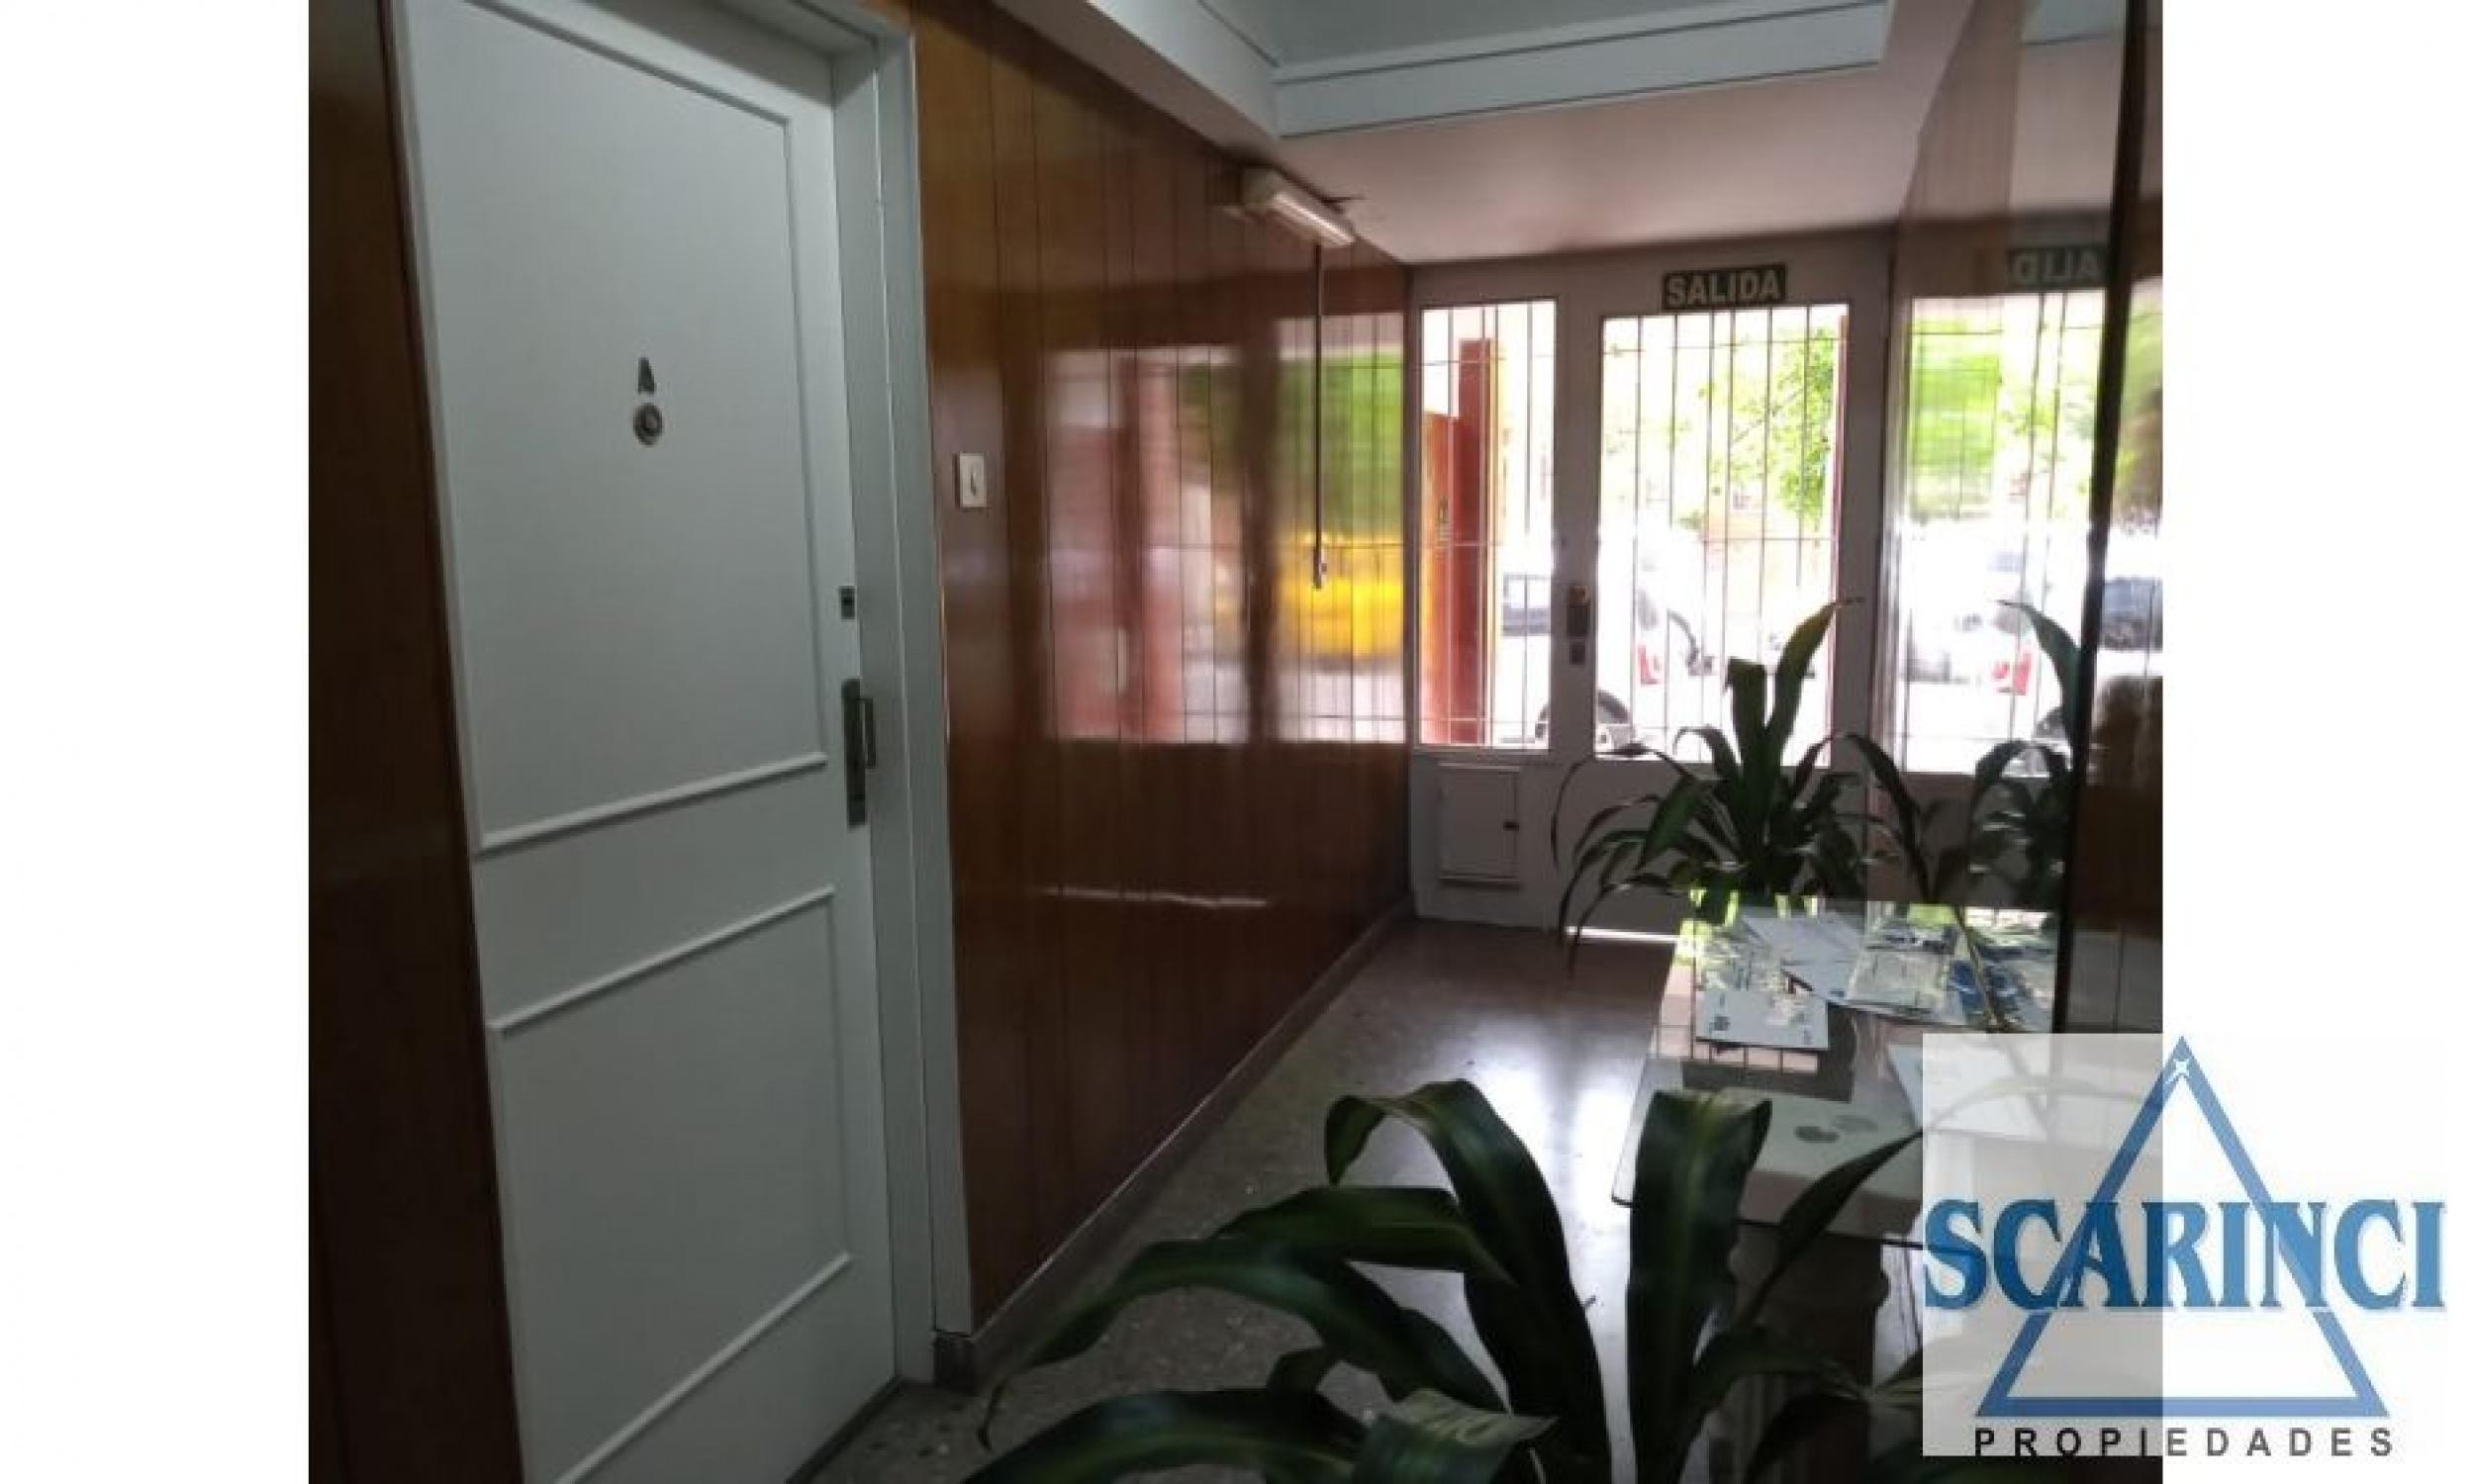 Neuquén 3400, Santos Lugares, Buenos Aires, Argentina, 3 Habitaciones Habitaciones, 2 Habitaciones Habitaciones,1 BañoBathrooms,Departamento,Venta,Neuquén ,1760